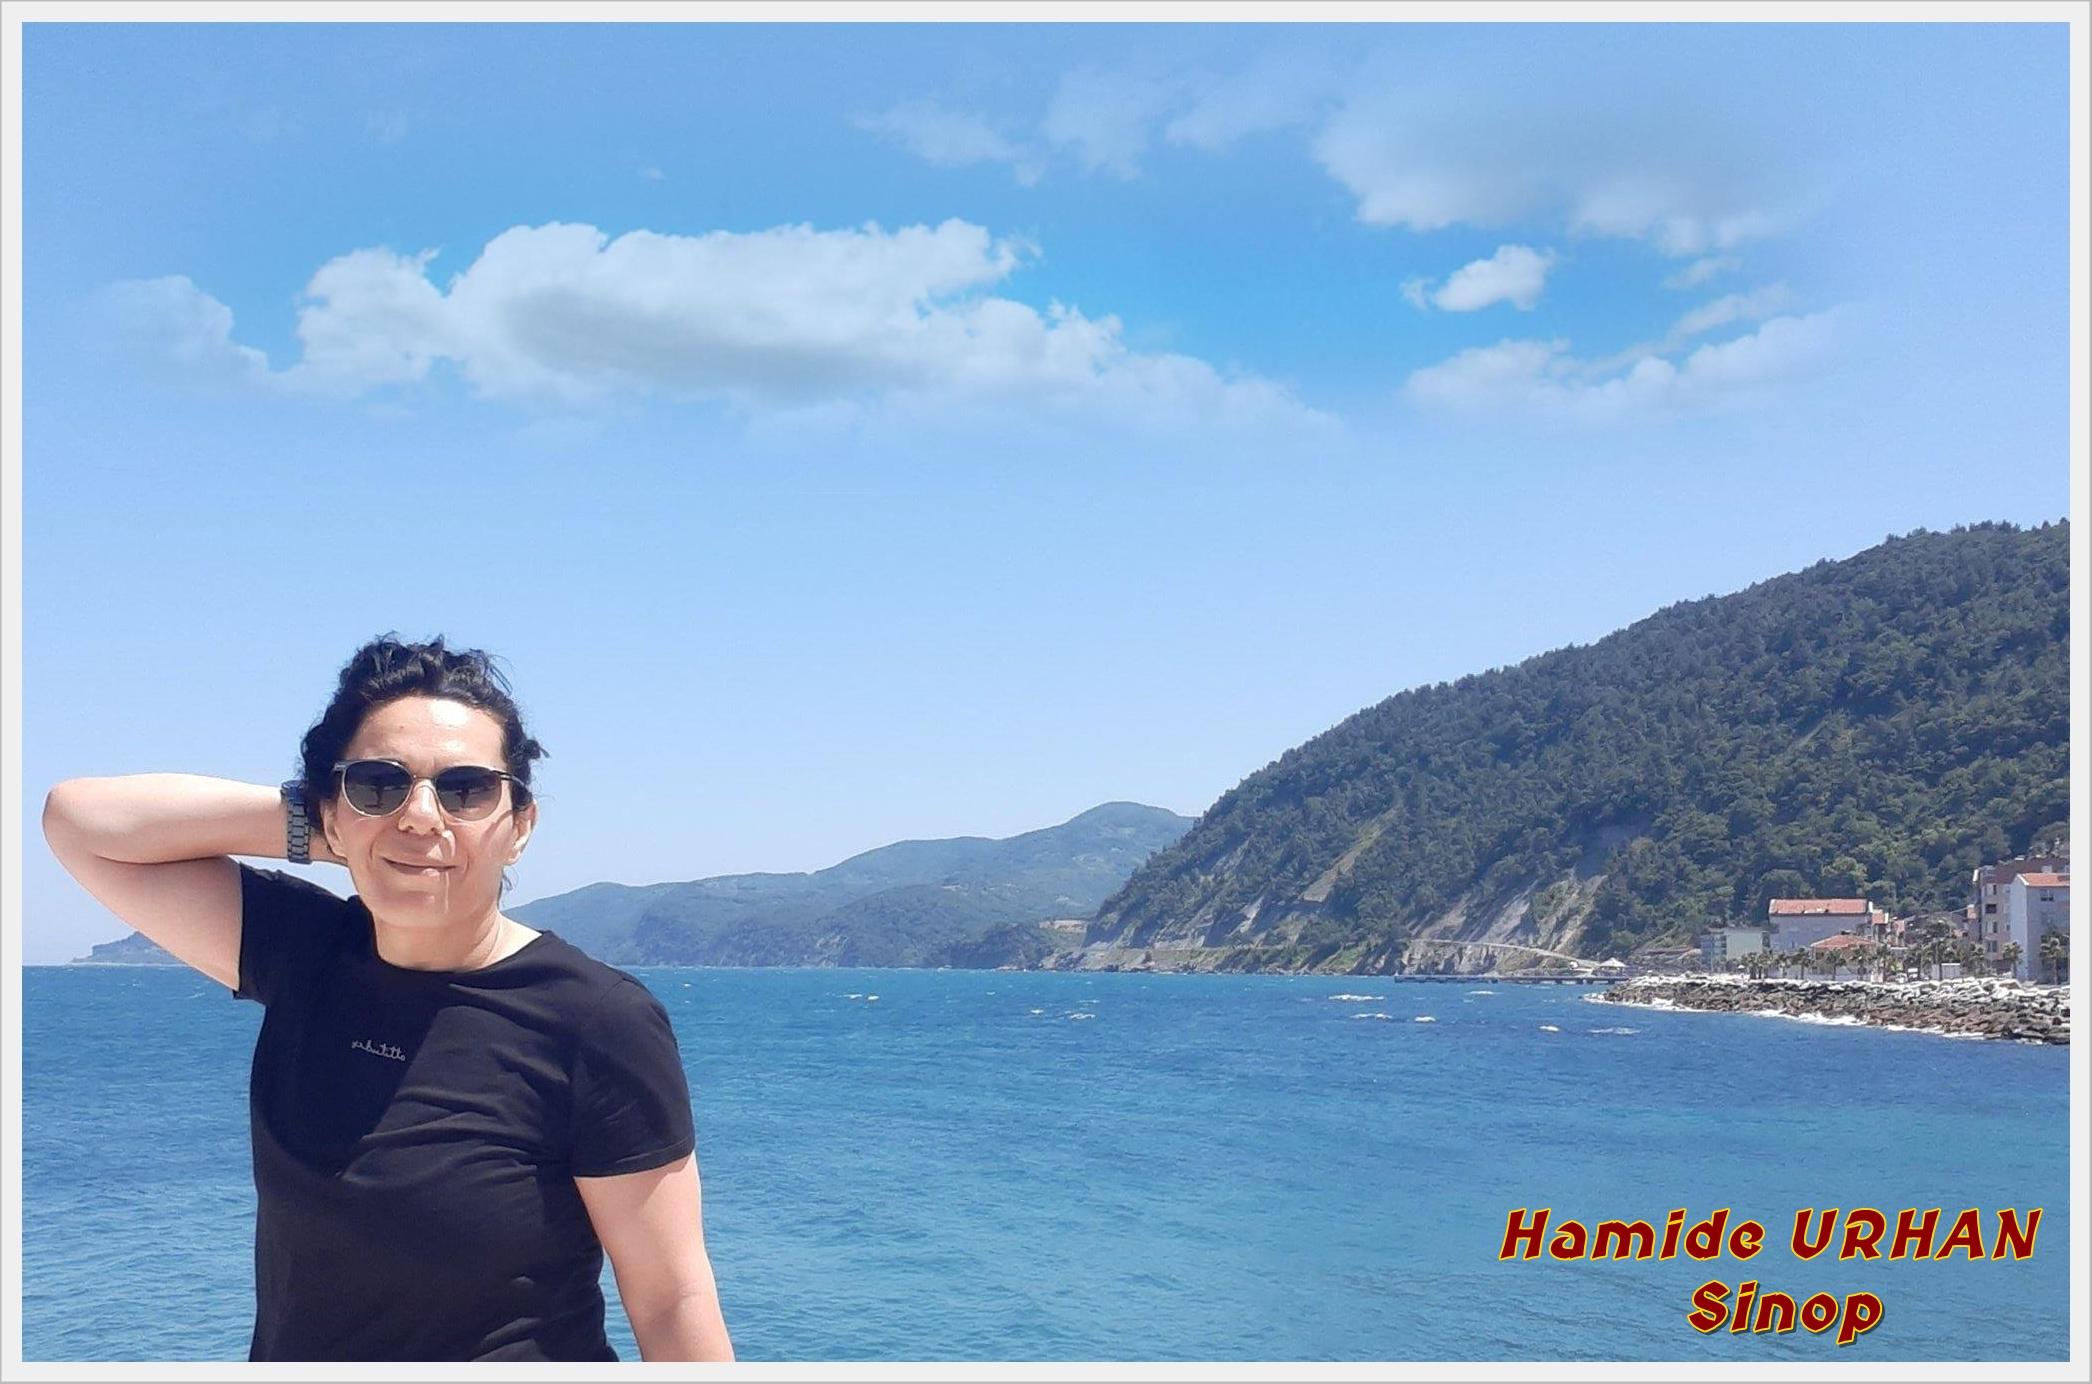 Hamide URHAN